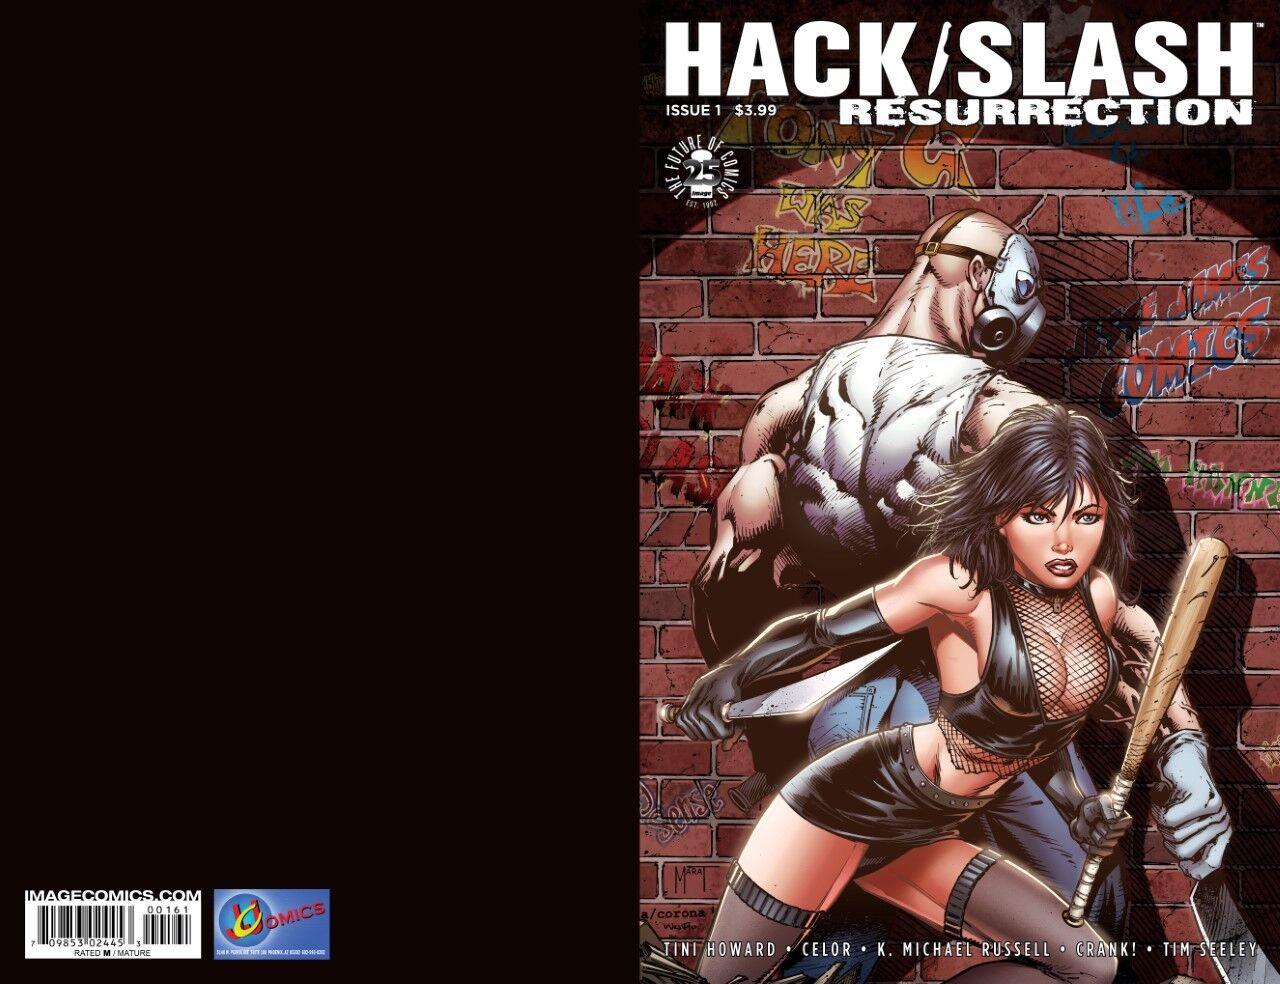 HACK / SLASH #1 RESURRECTION JESSE JAMES COMICS EXCLUSIVE LTD 500 COMIC BOOK